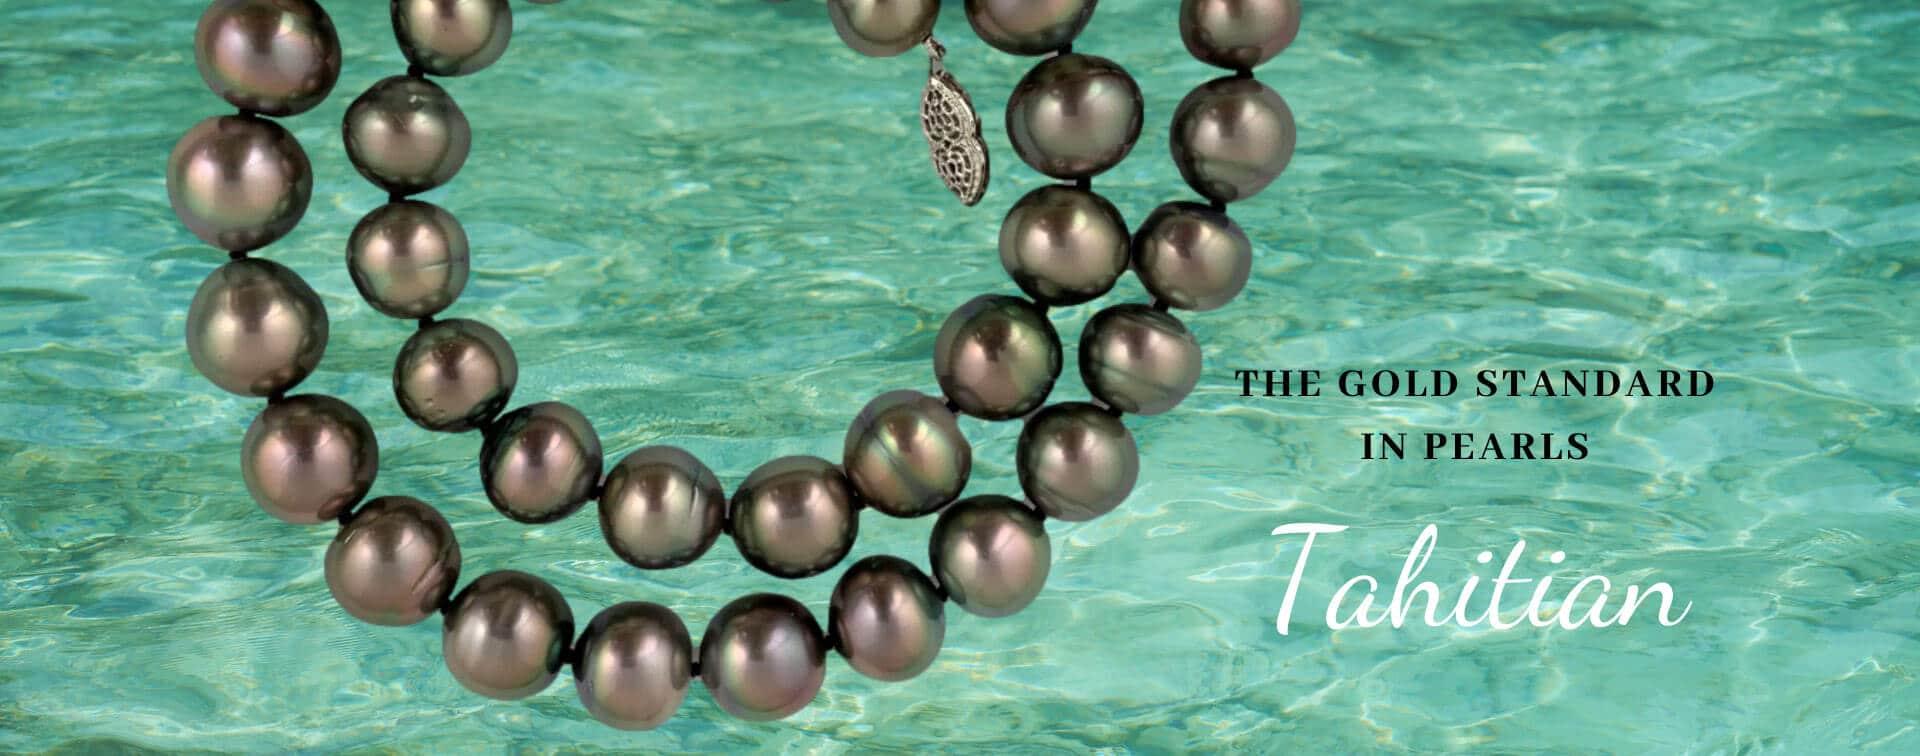 Tahitian Pearls over water banner